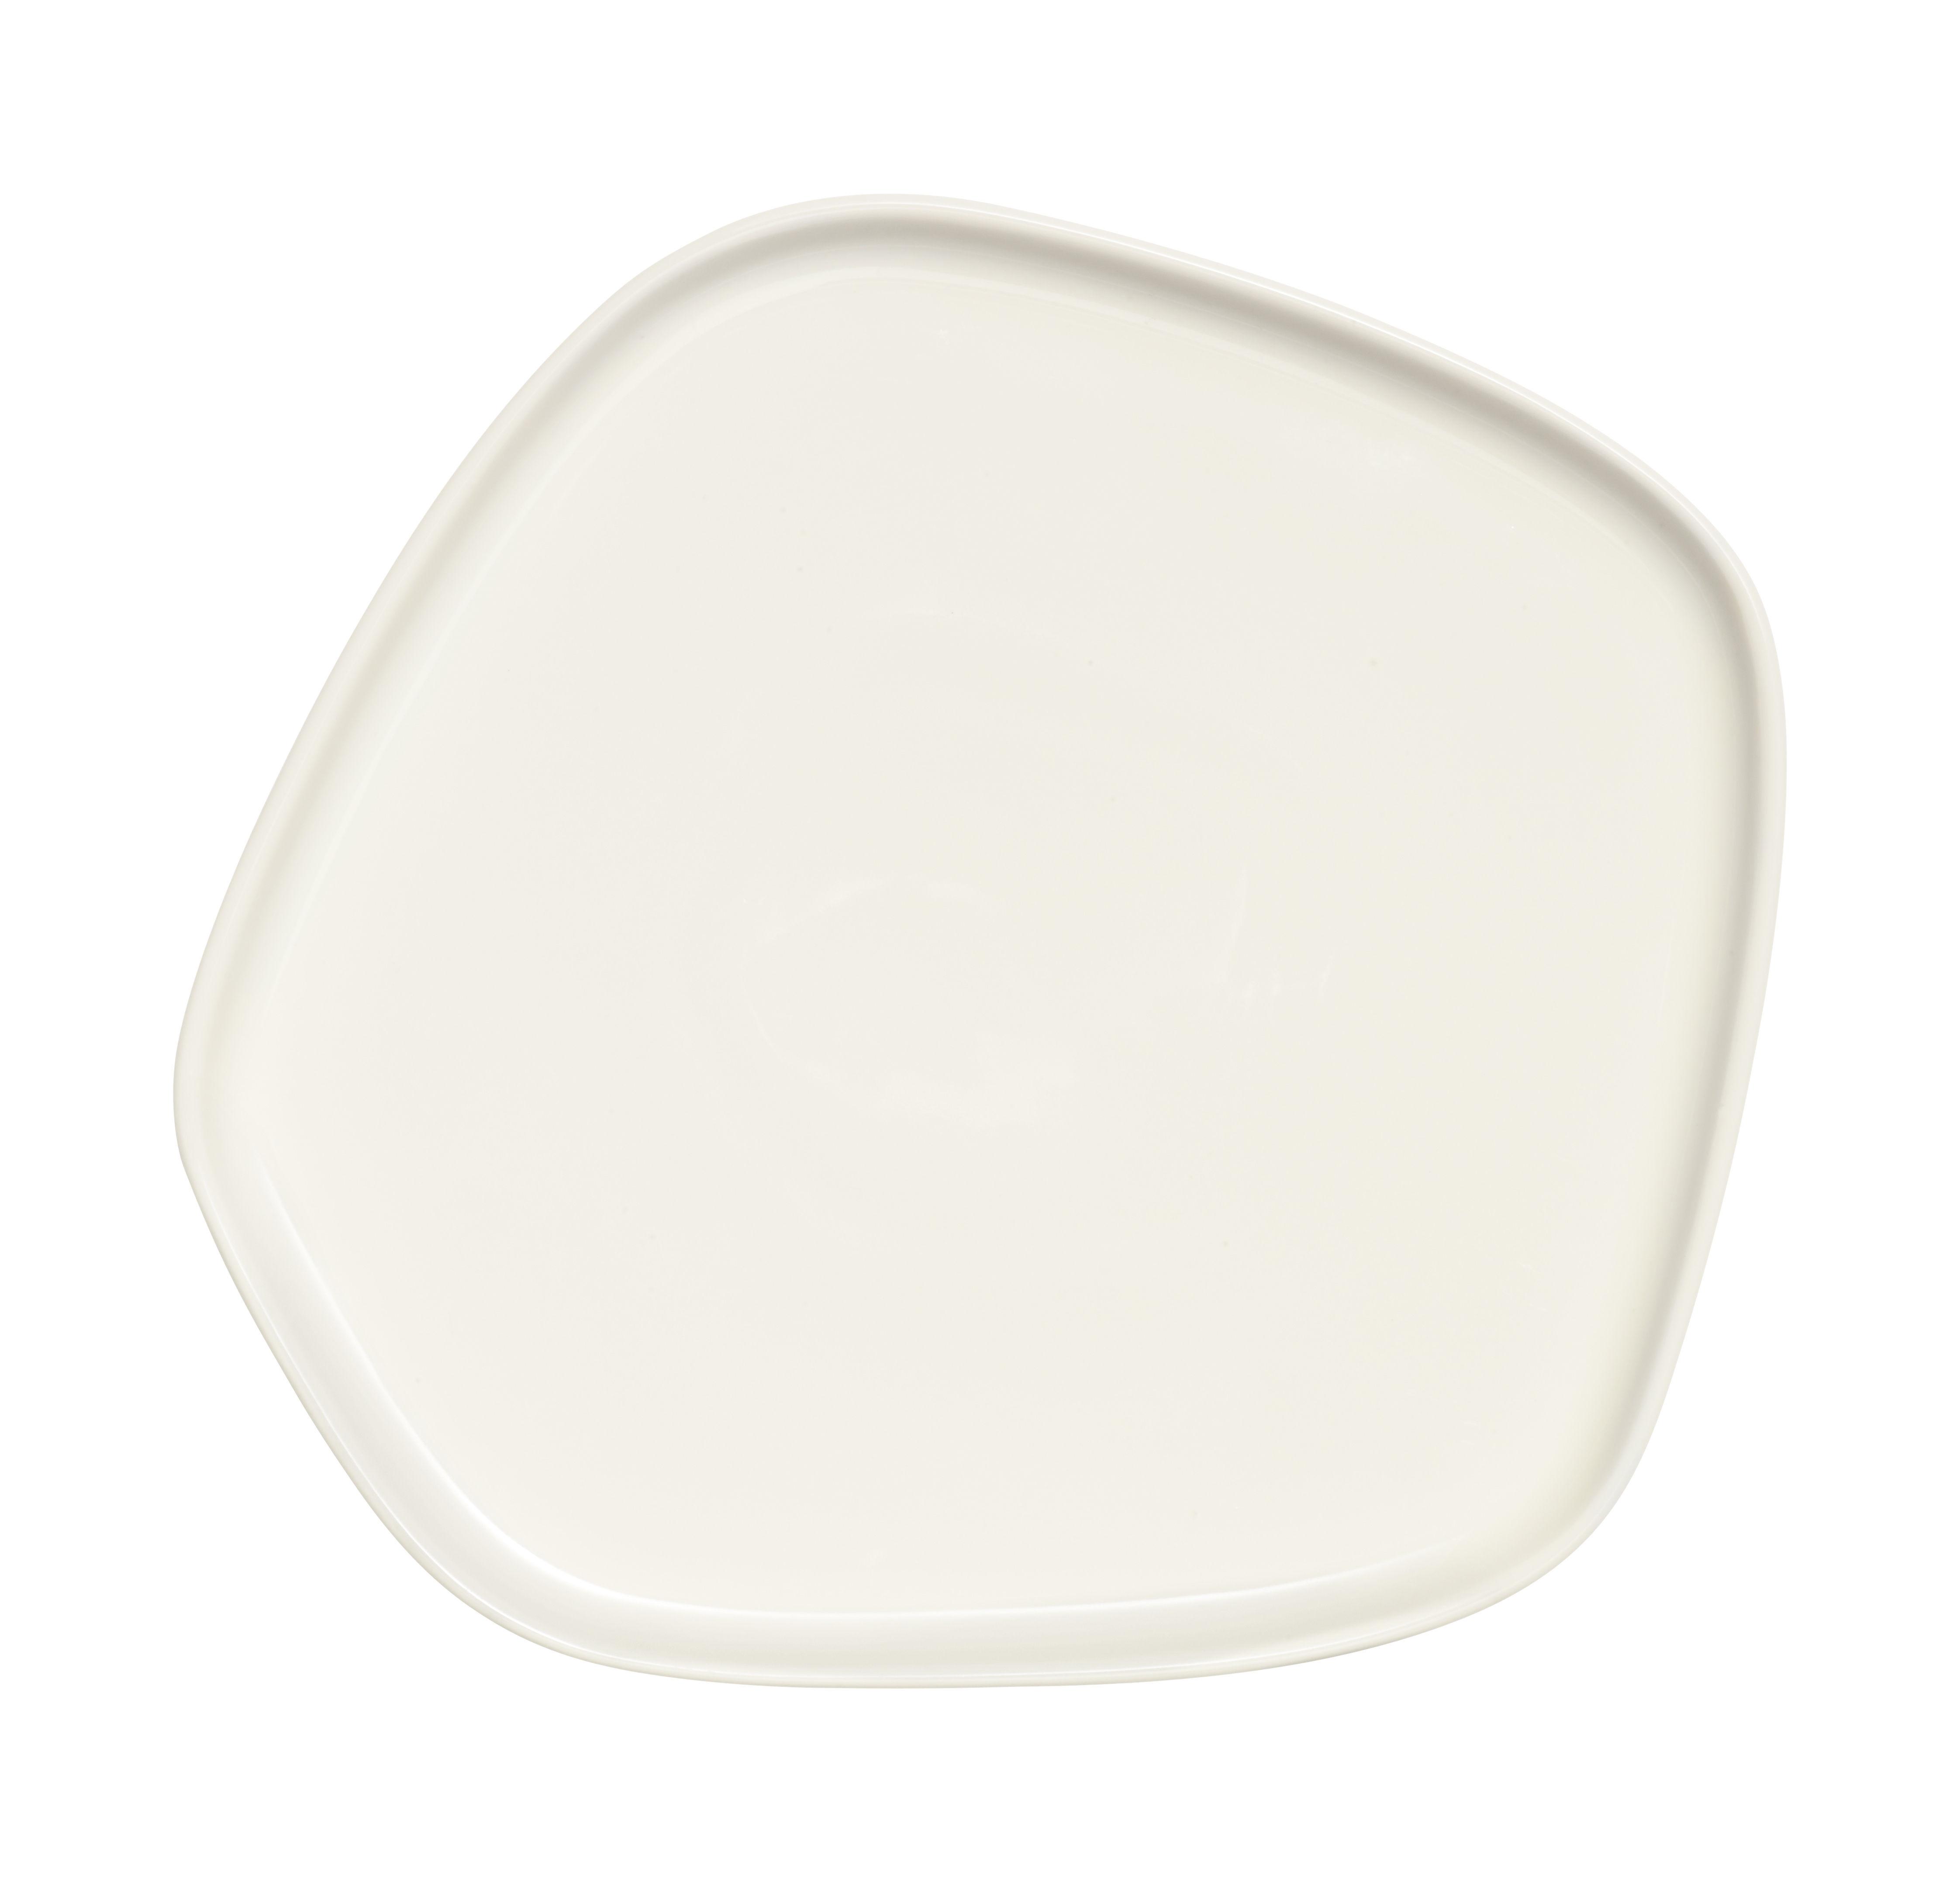 Tableware - Plates - Iittala X Issey Miyake Plate - 21 x 20 cm by Iittala - White - China